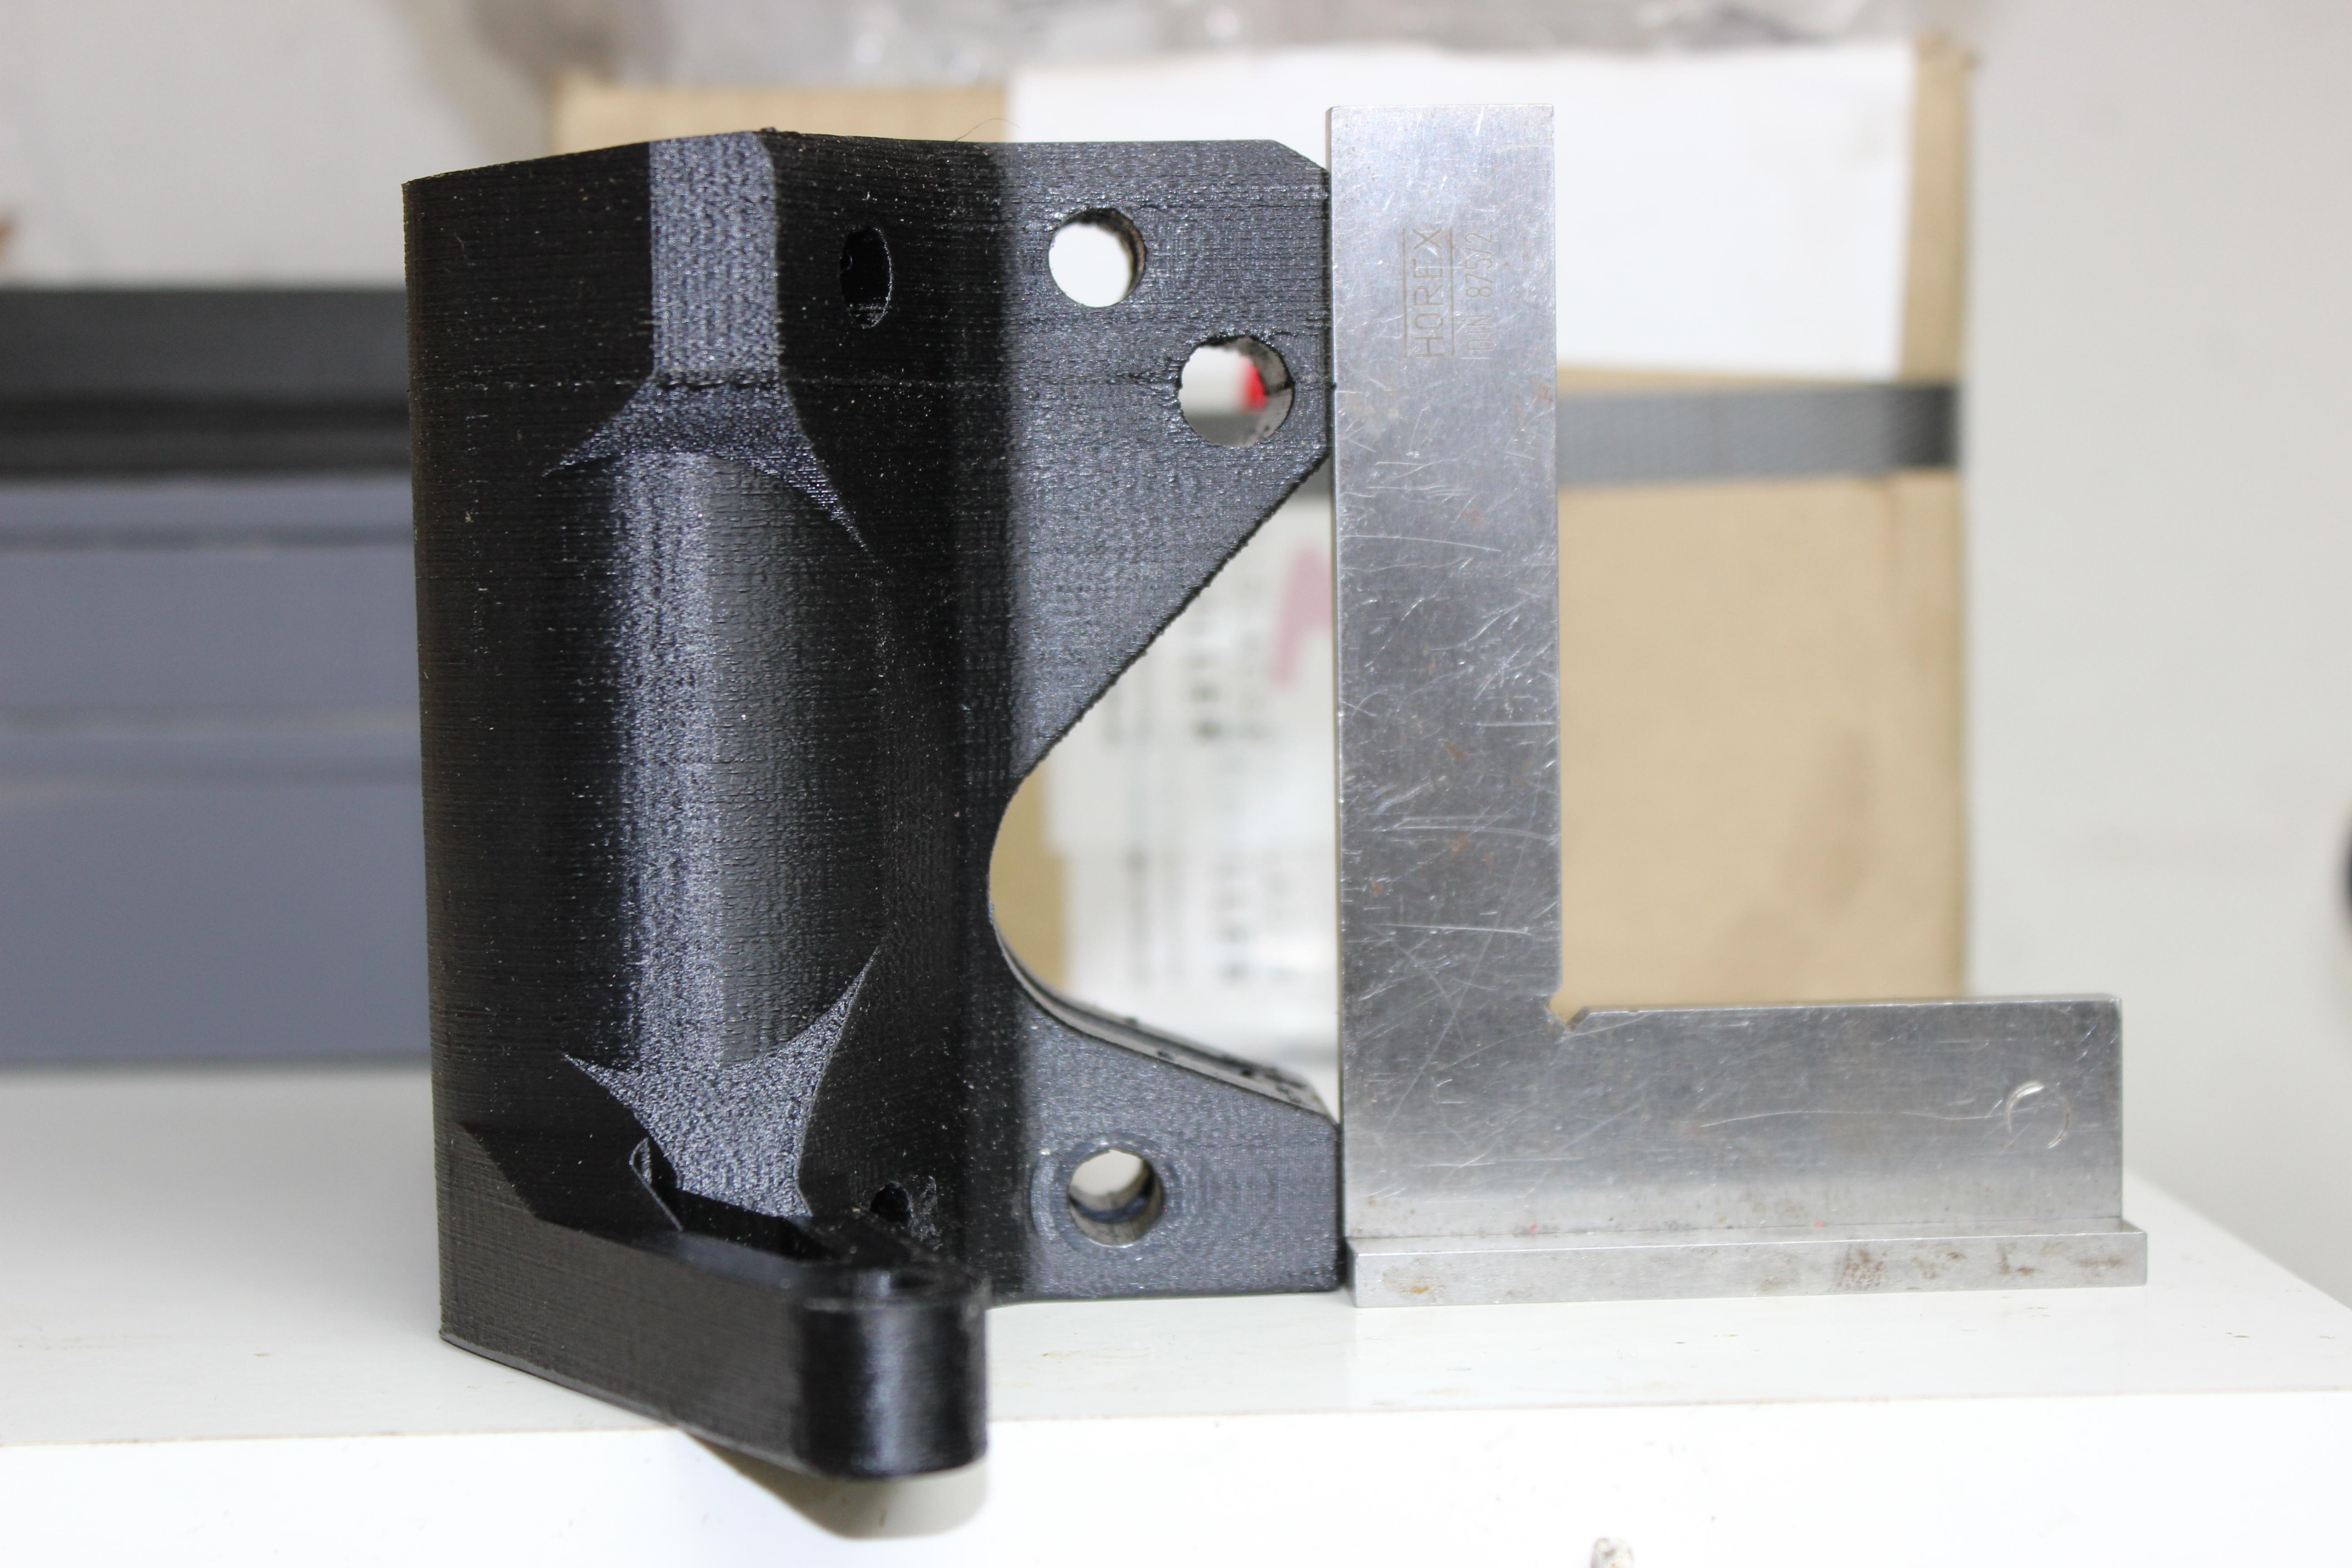 Please help me getting the Gantry perpendicular | V1 Engineering